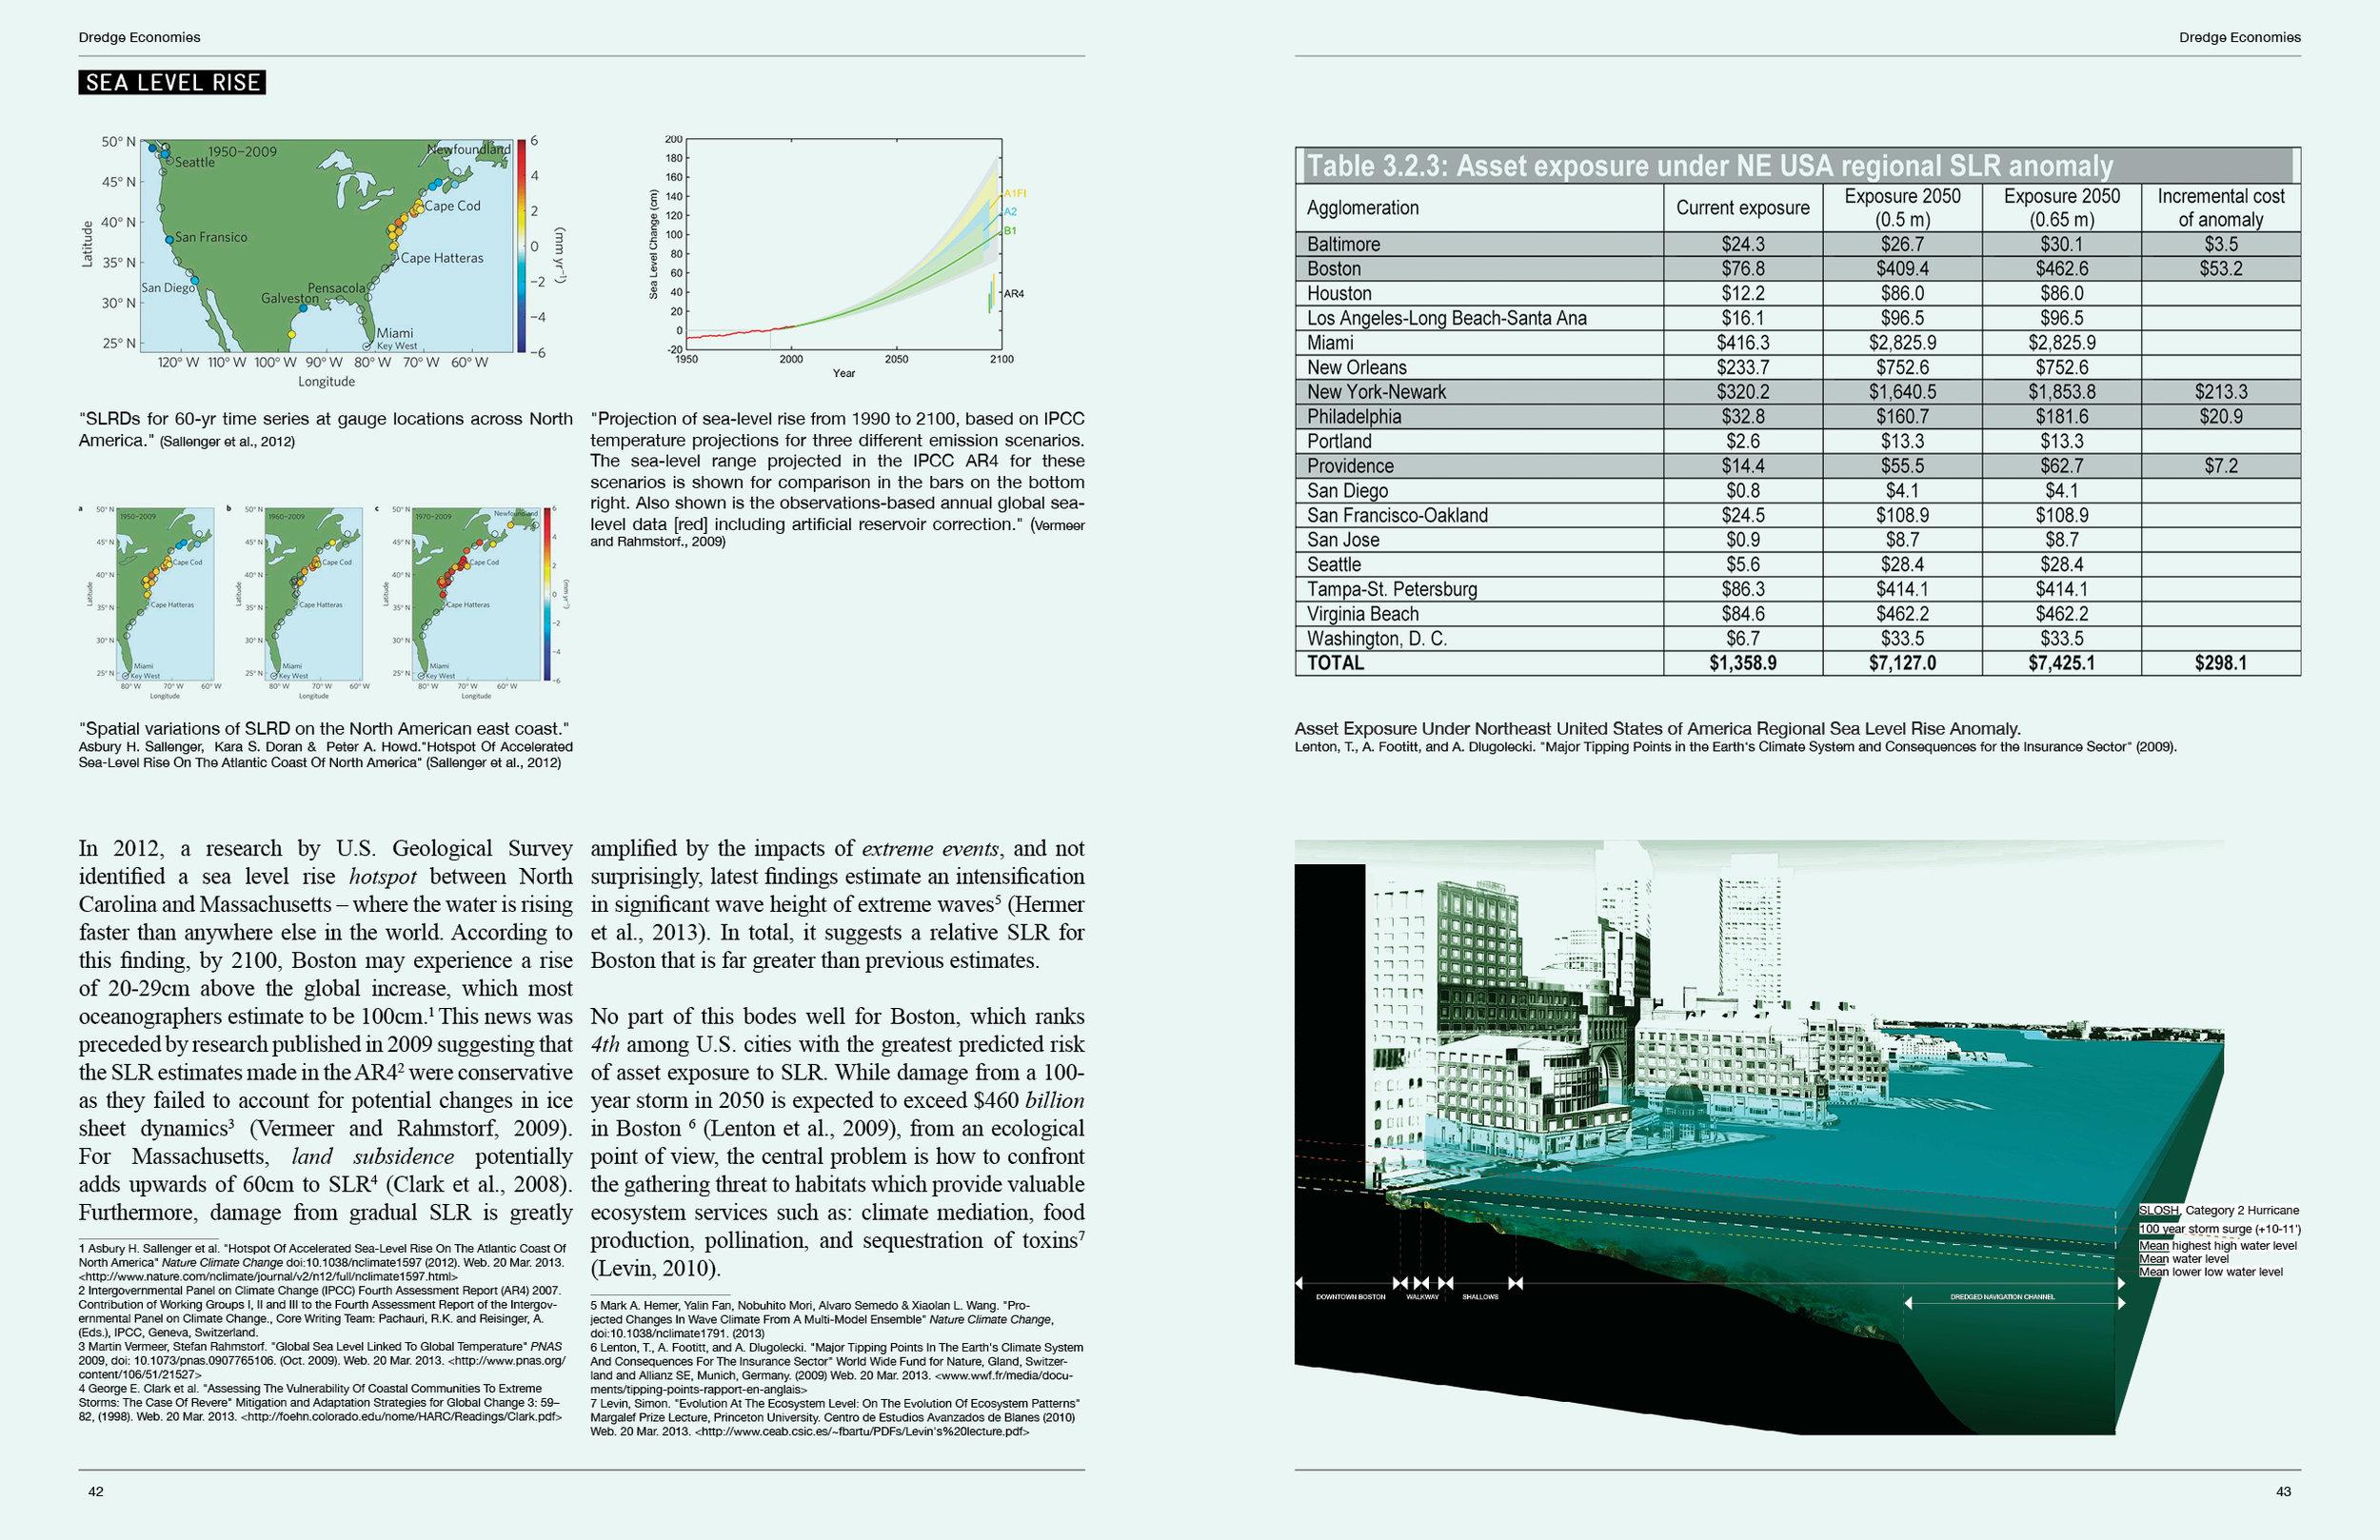 Dredge Economies Chapter 22.jpg